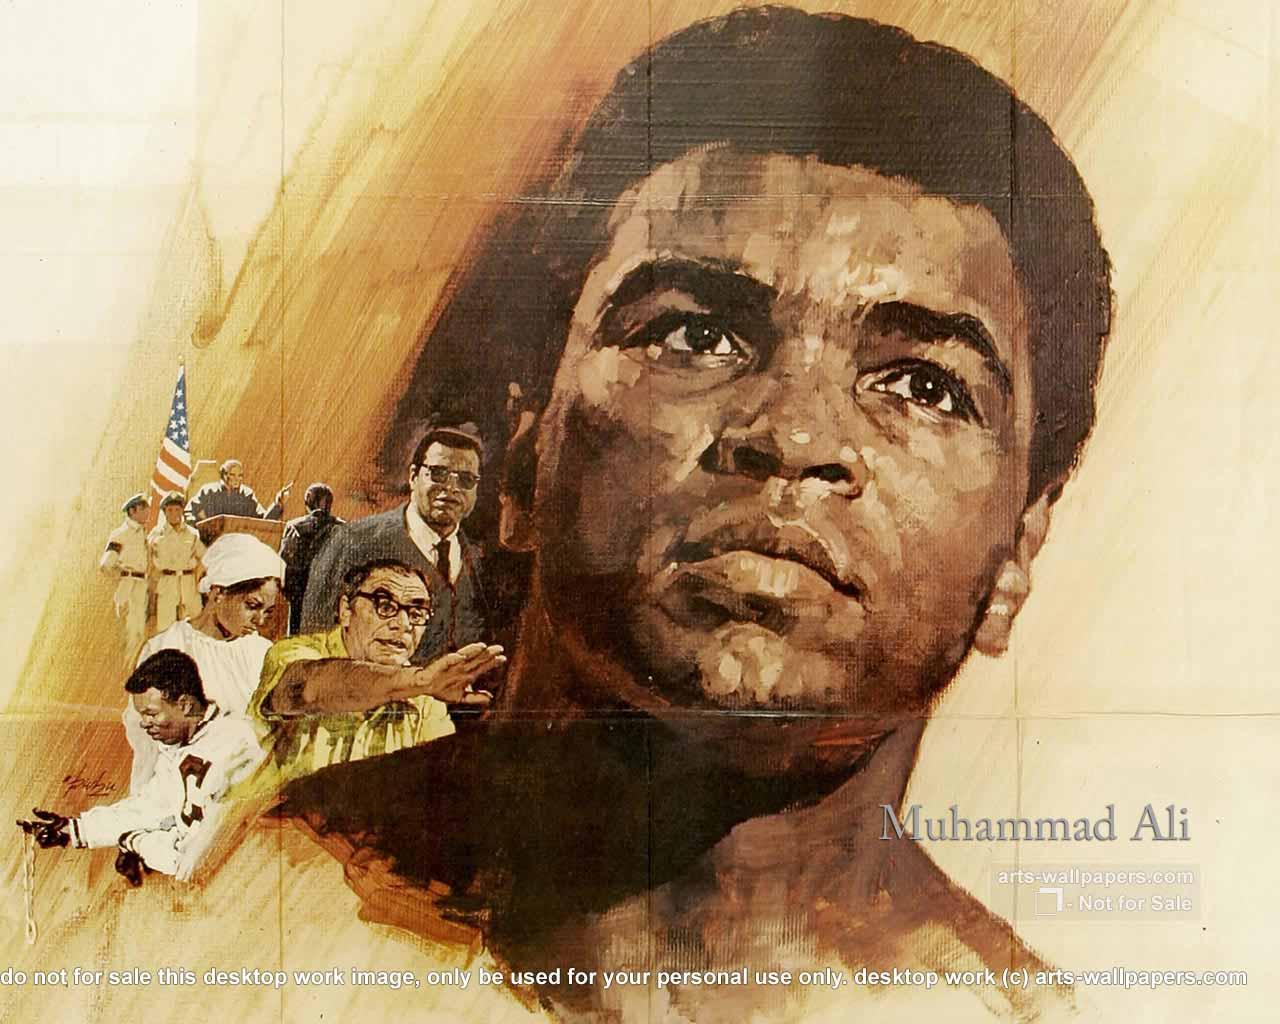 Muhammad Ali Boxer Wallpapers